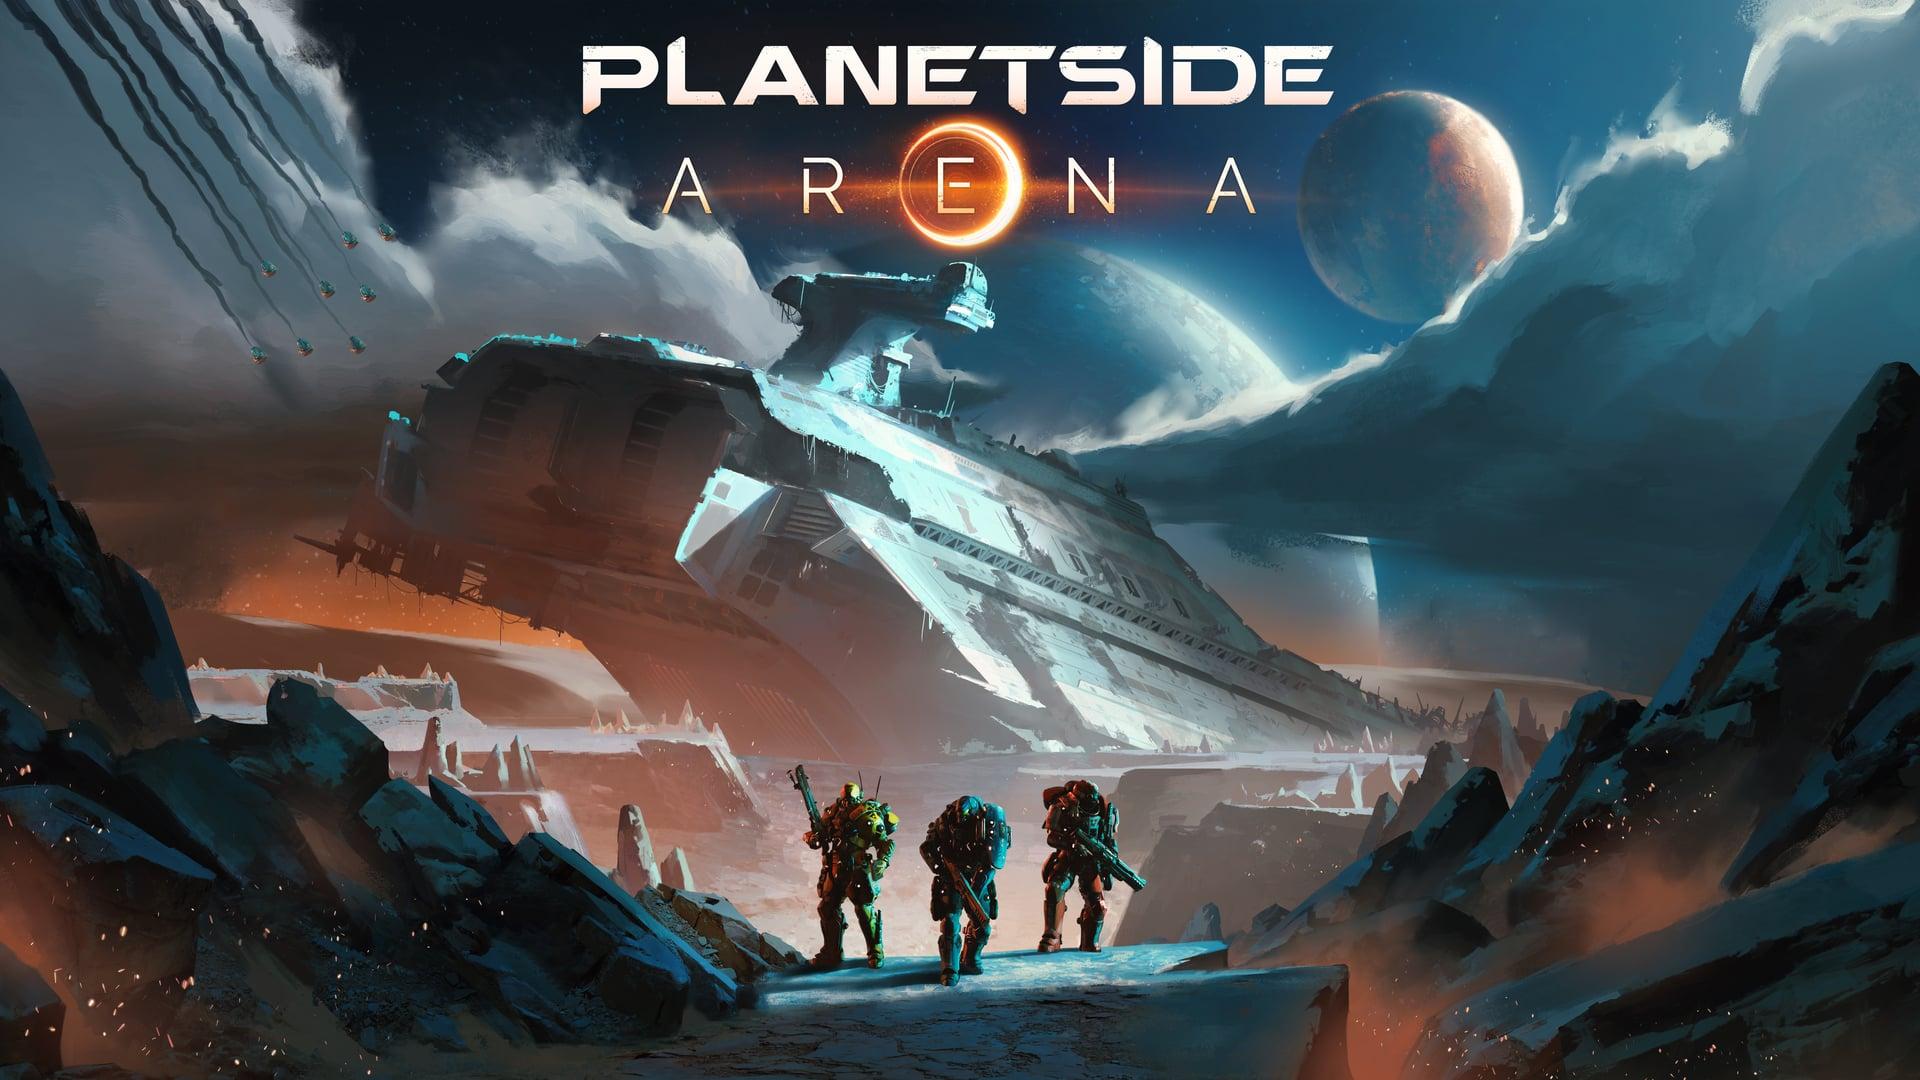 Planetside Arena Cover